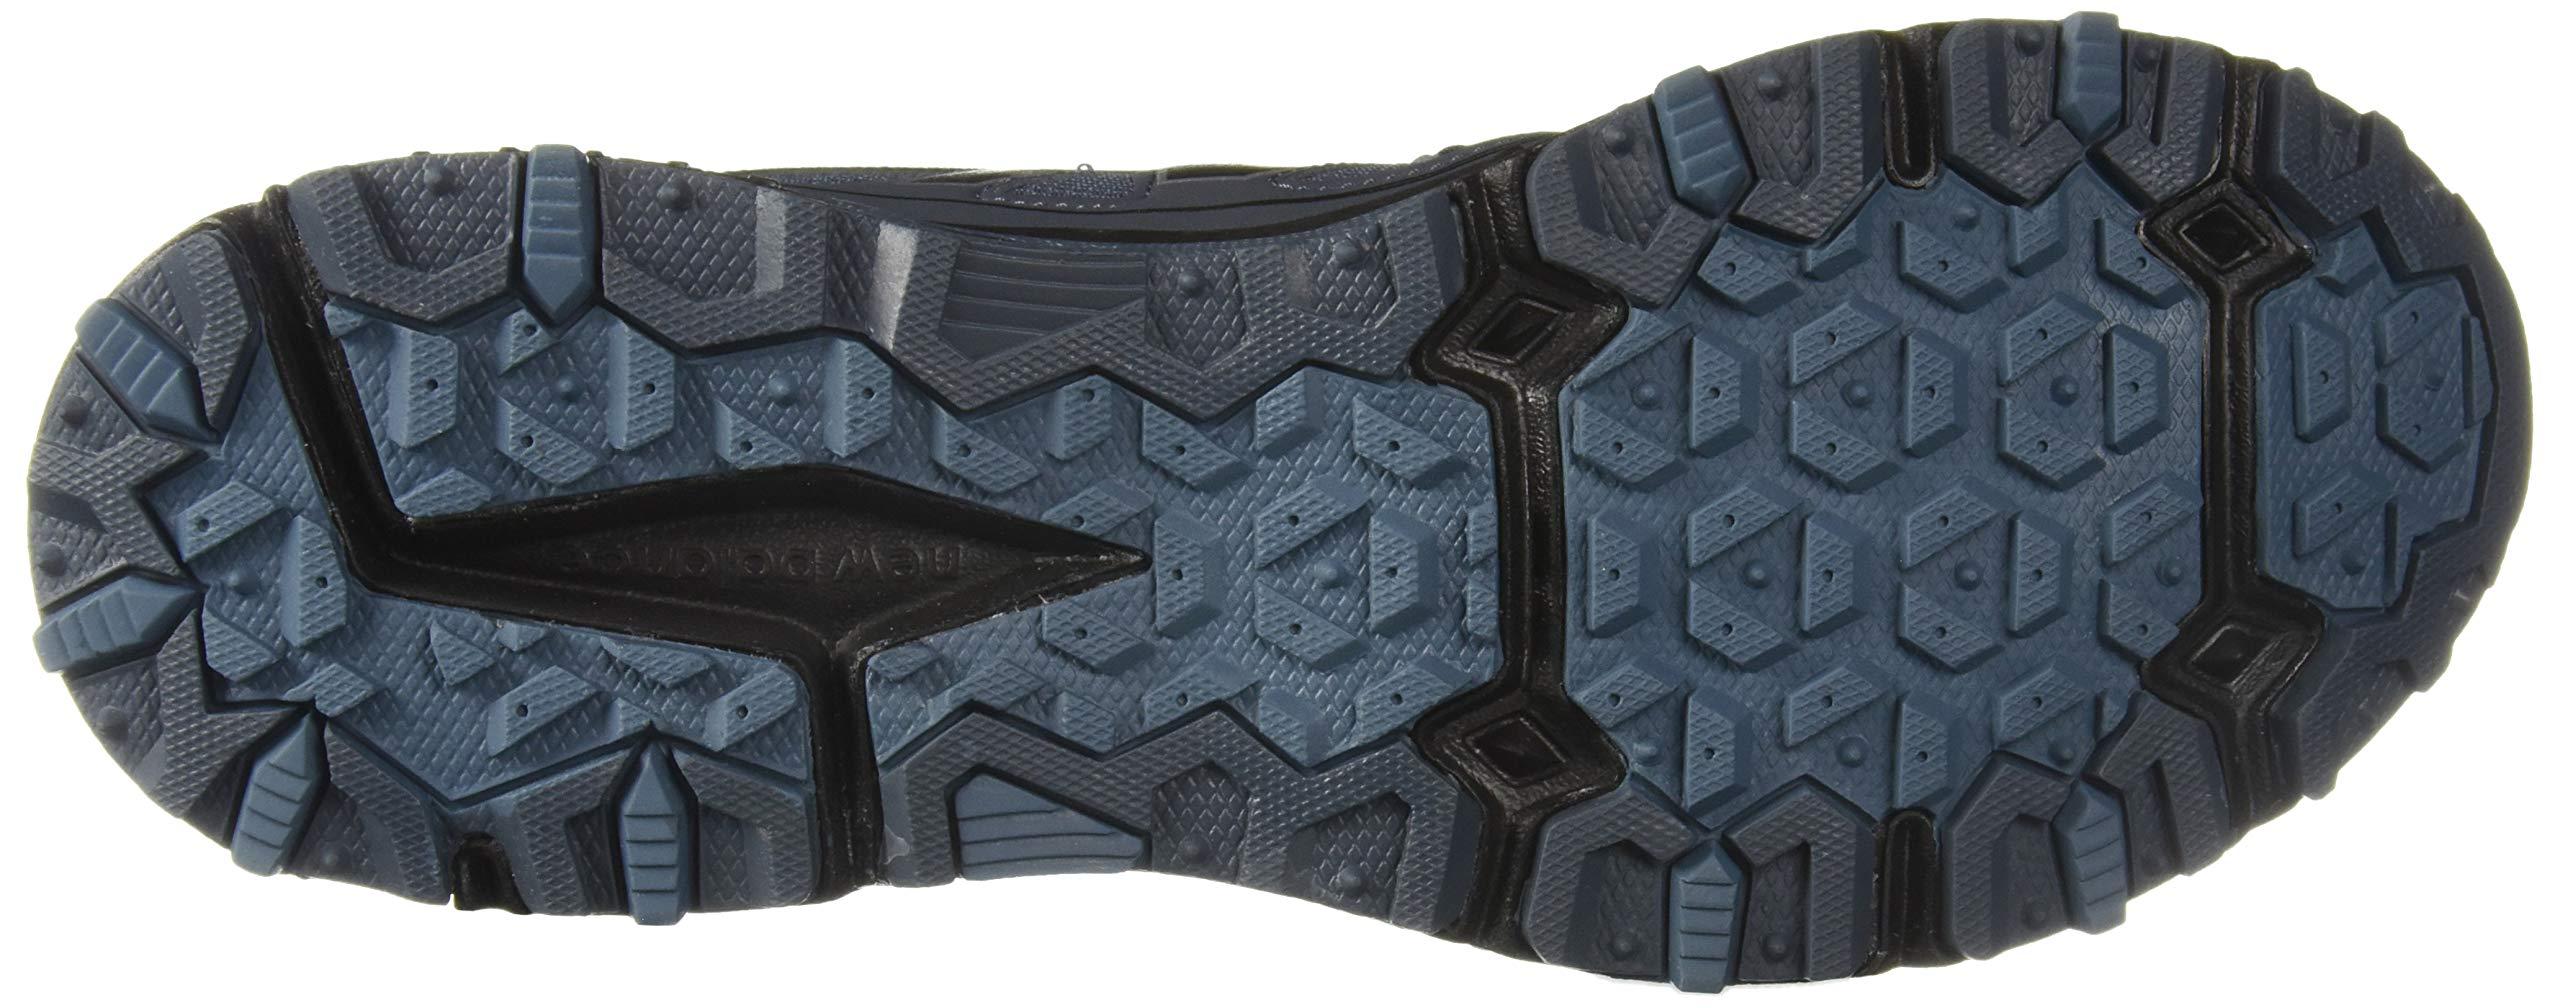 New Balance Men's 410v5 Cushioning Trail Running Shoe, Petrol/Cadet/Black, 7 D US by New Balance (Image #3)